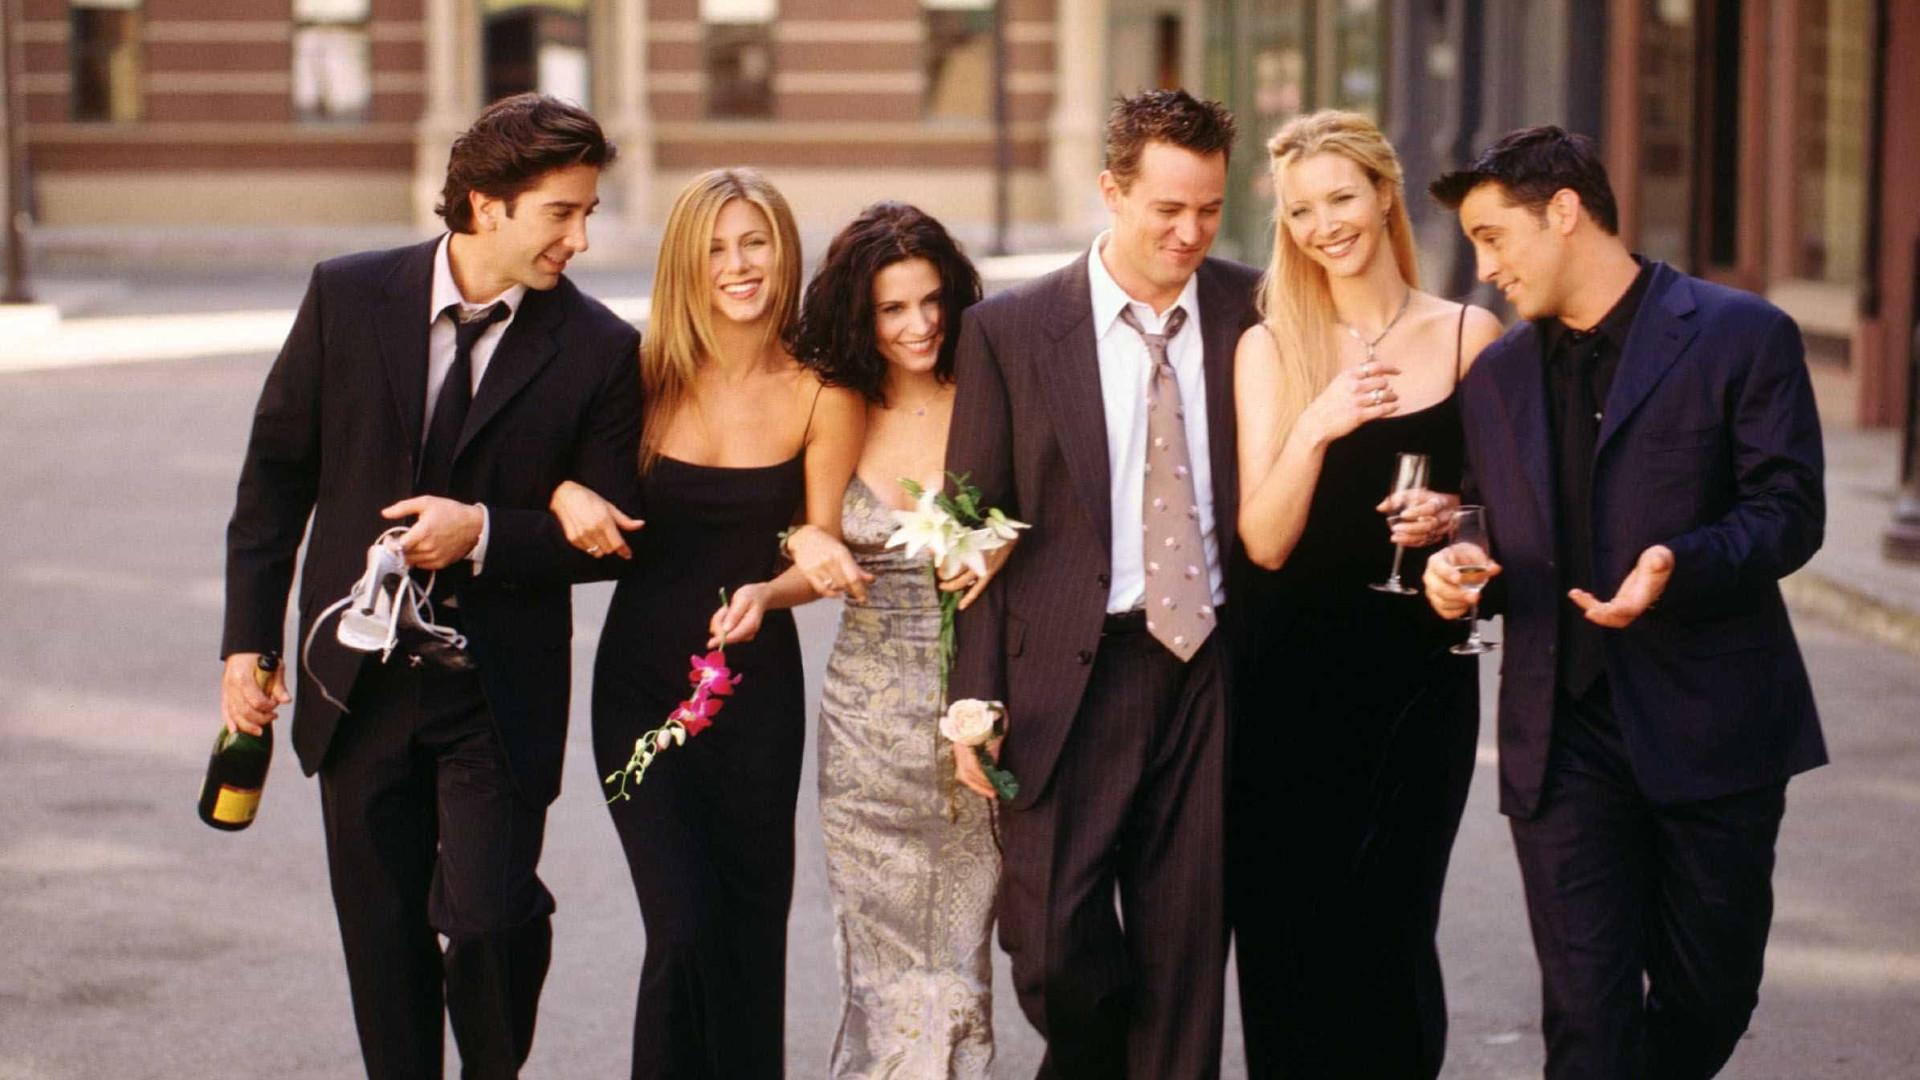 Elenco de Friends sabia de problemas de Matthew Perry